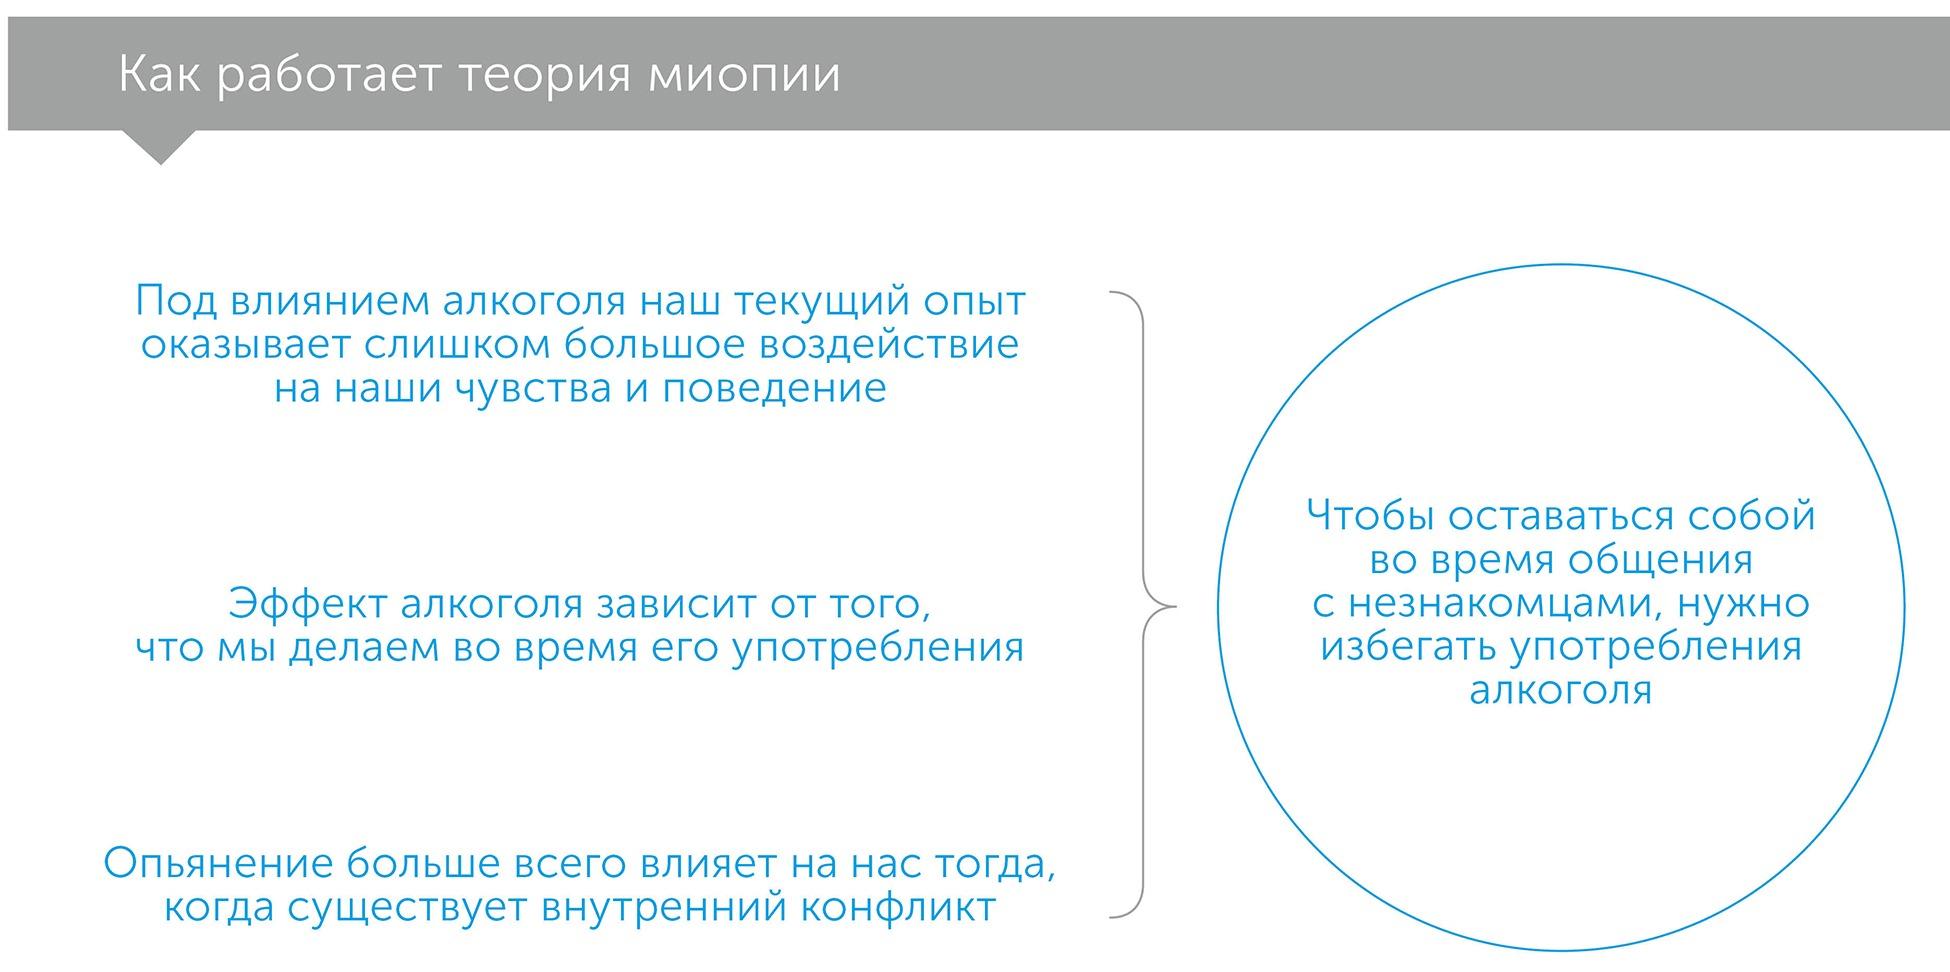 Разговор с незнакомцами, author Малкольм Гладуэлл   Kyivstar Business Hub, image №3